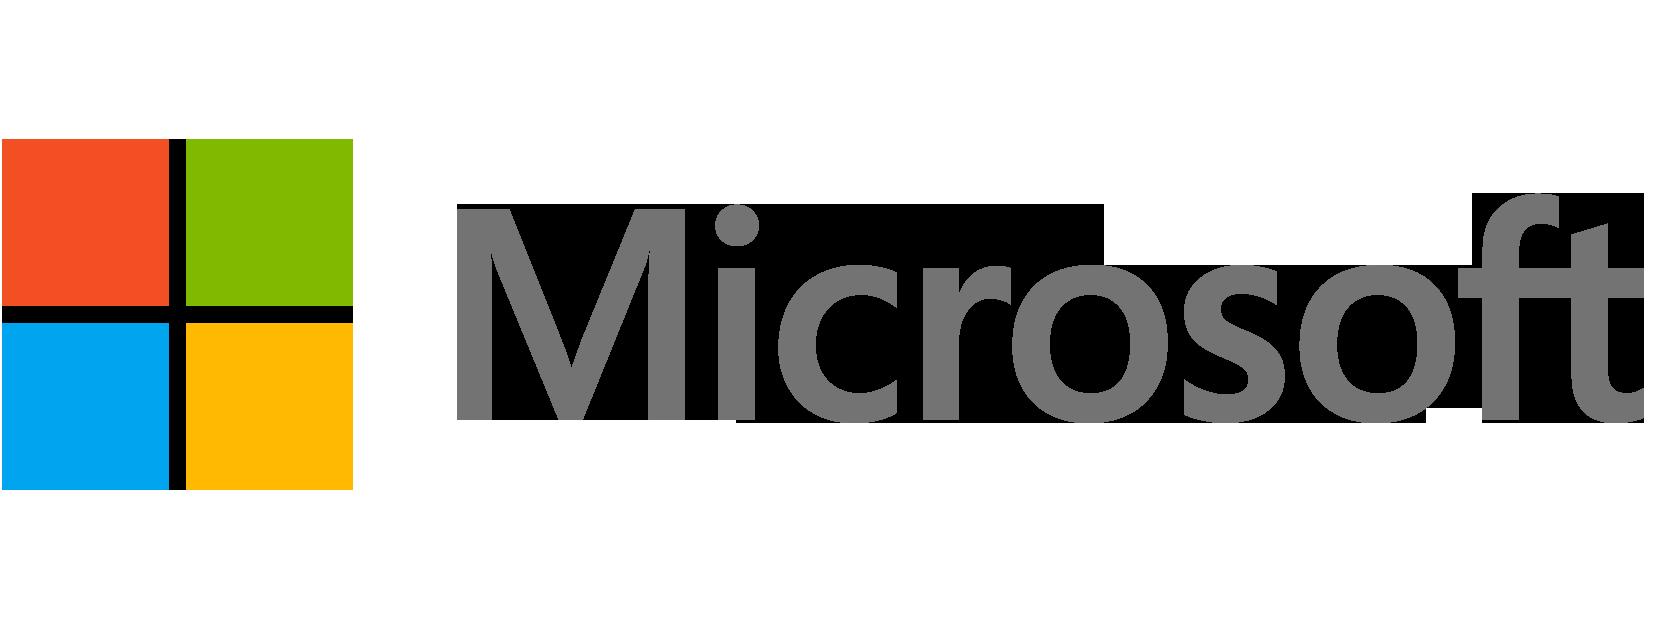 Microsoft משתתפת בתוכנית